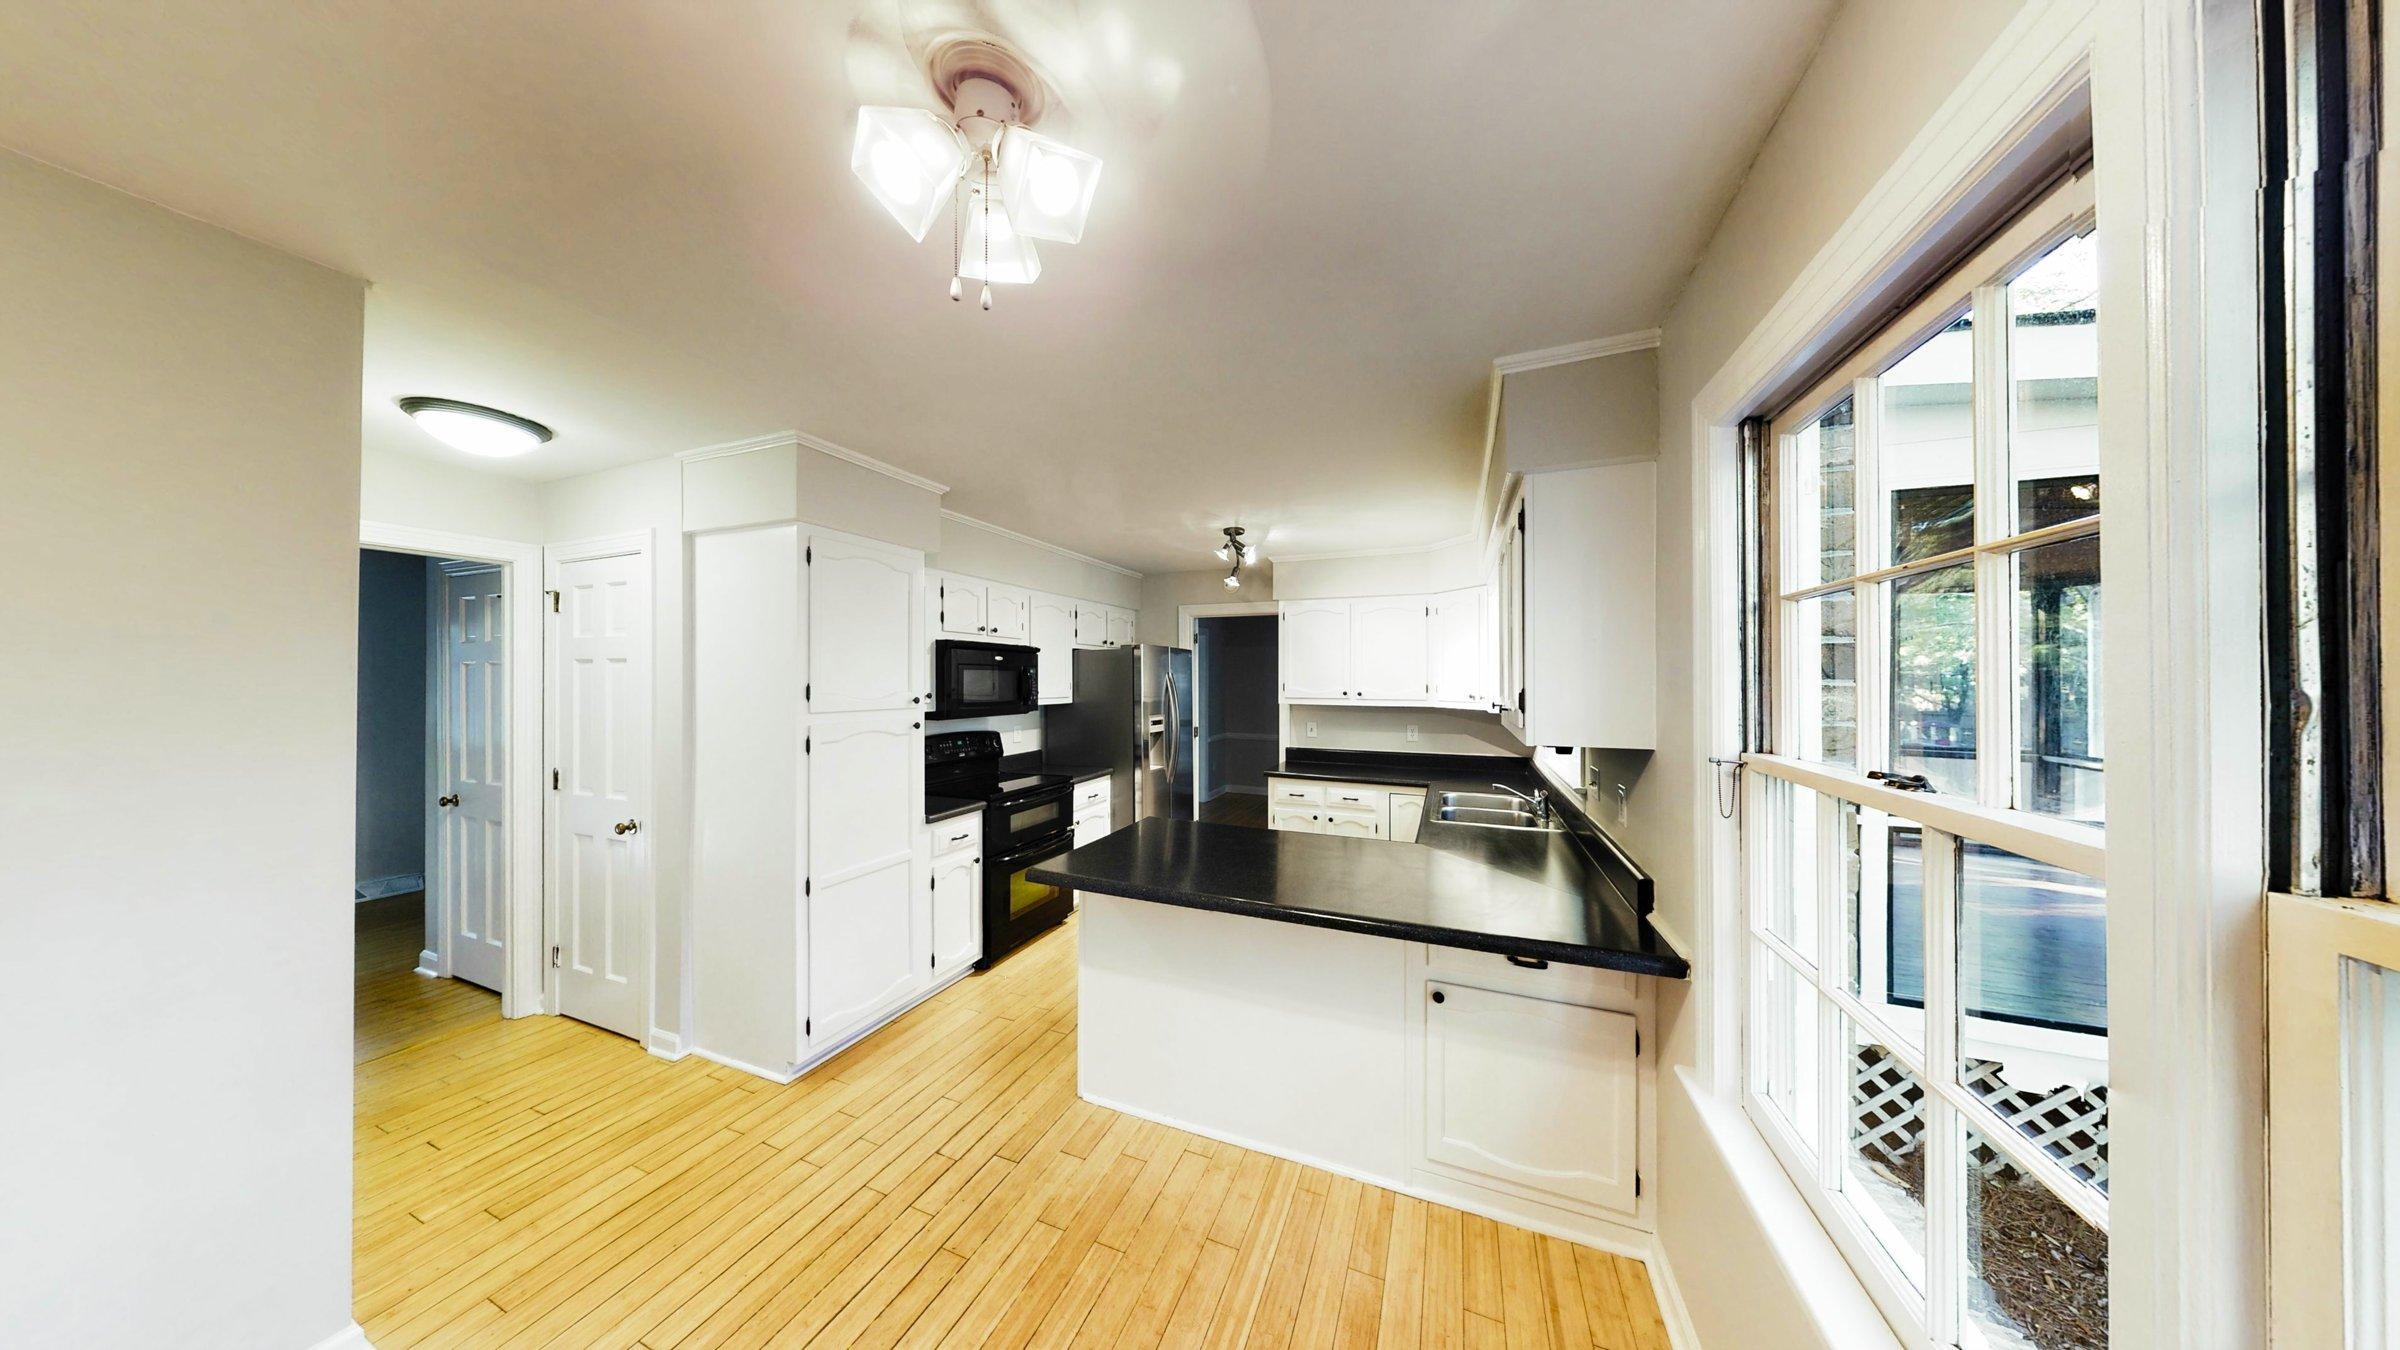 Snee Farm Homes For Sale - 1168 Parkway, Mount Pleasant, SC - 15